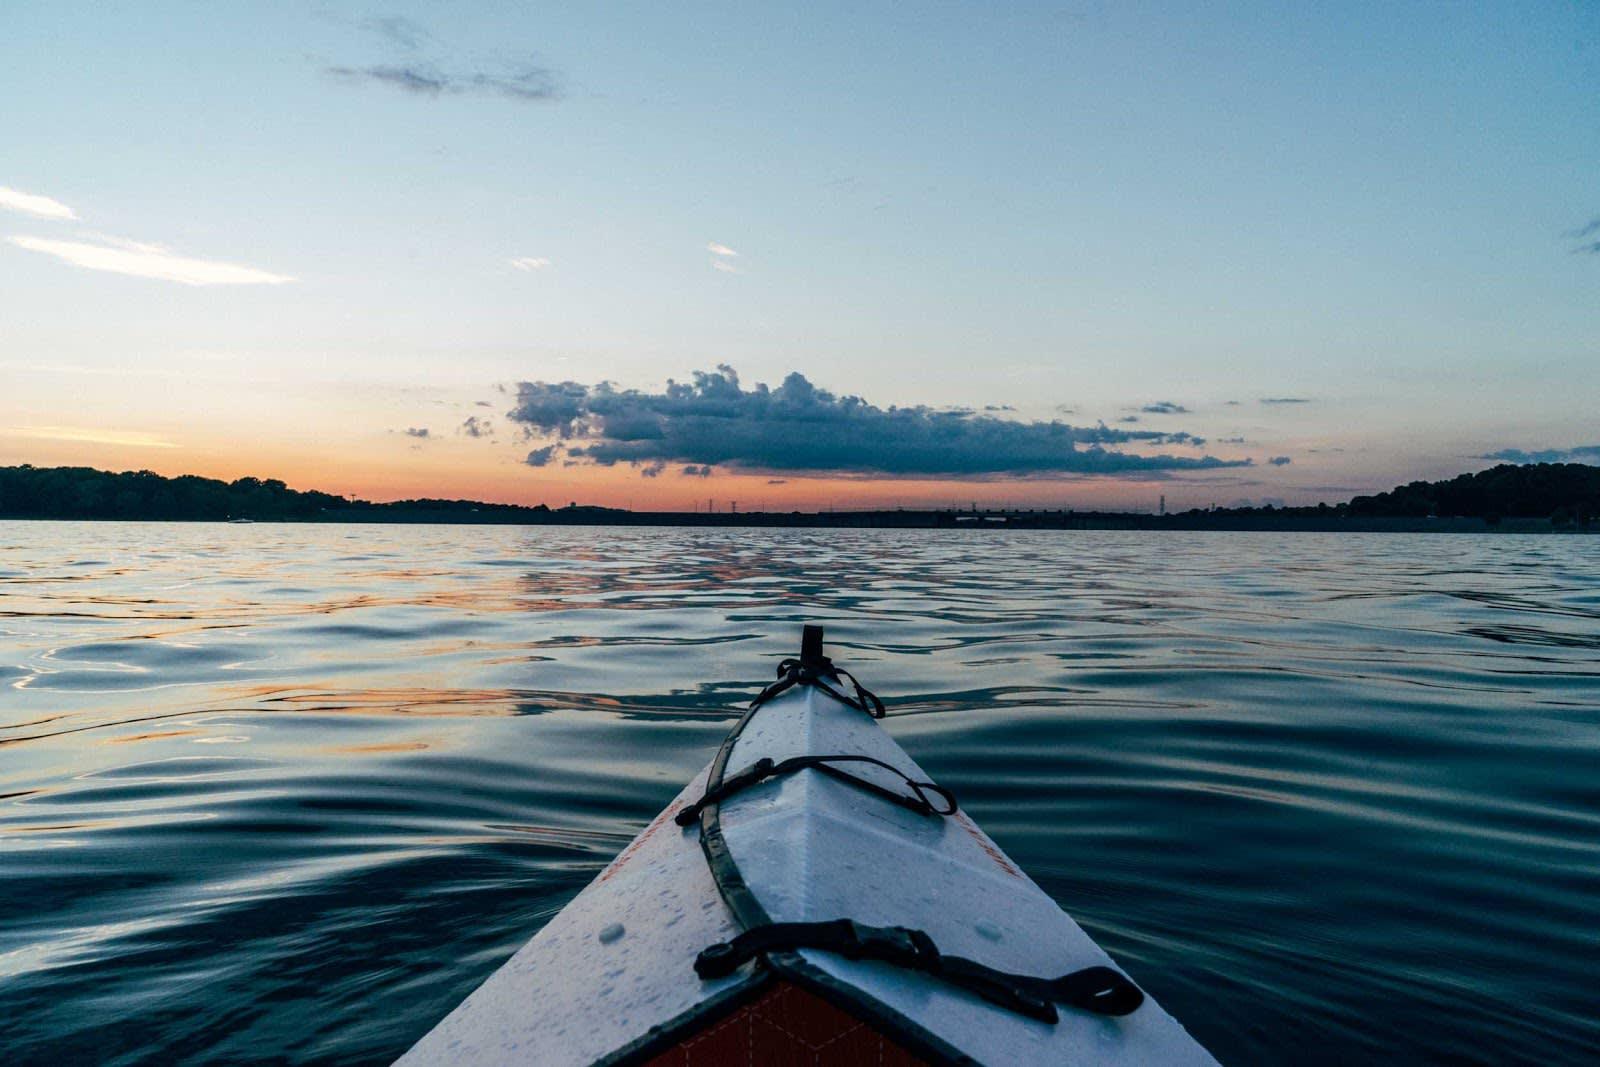 SUP, Kayak, & Canoe Asheville This Summer